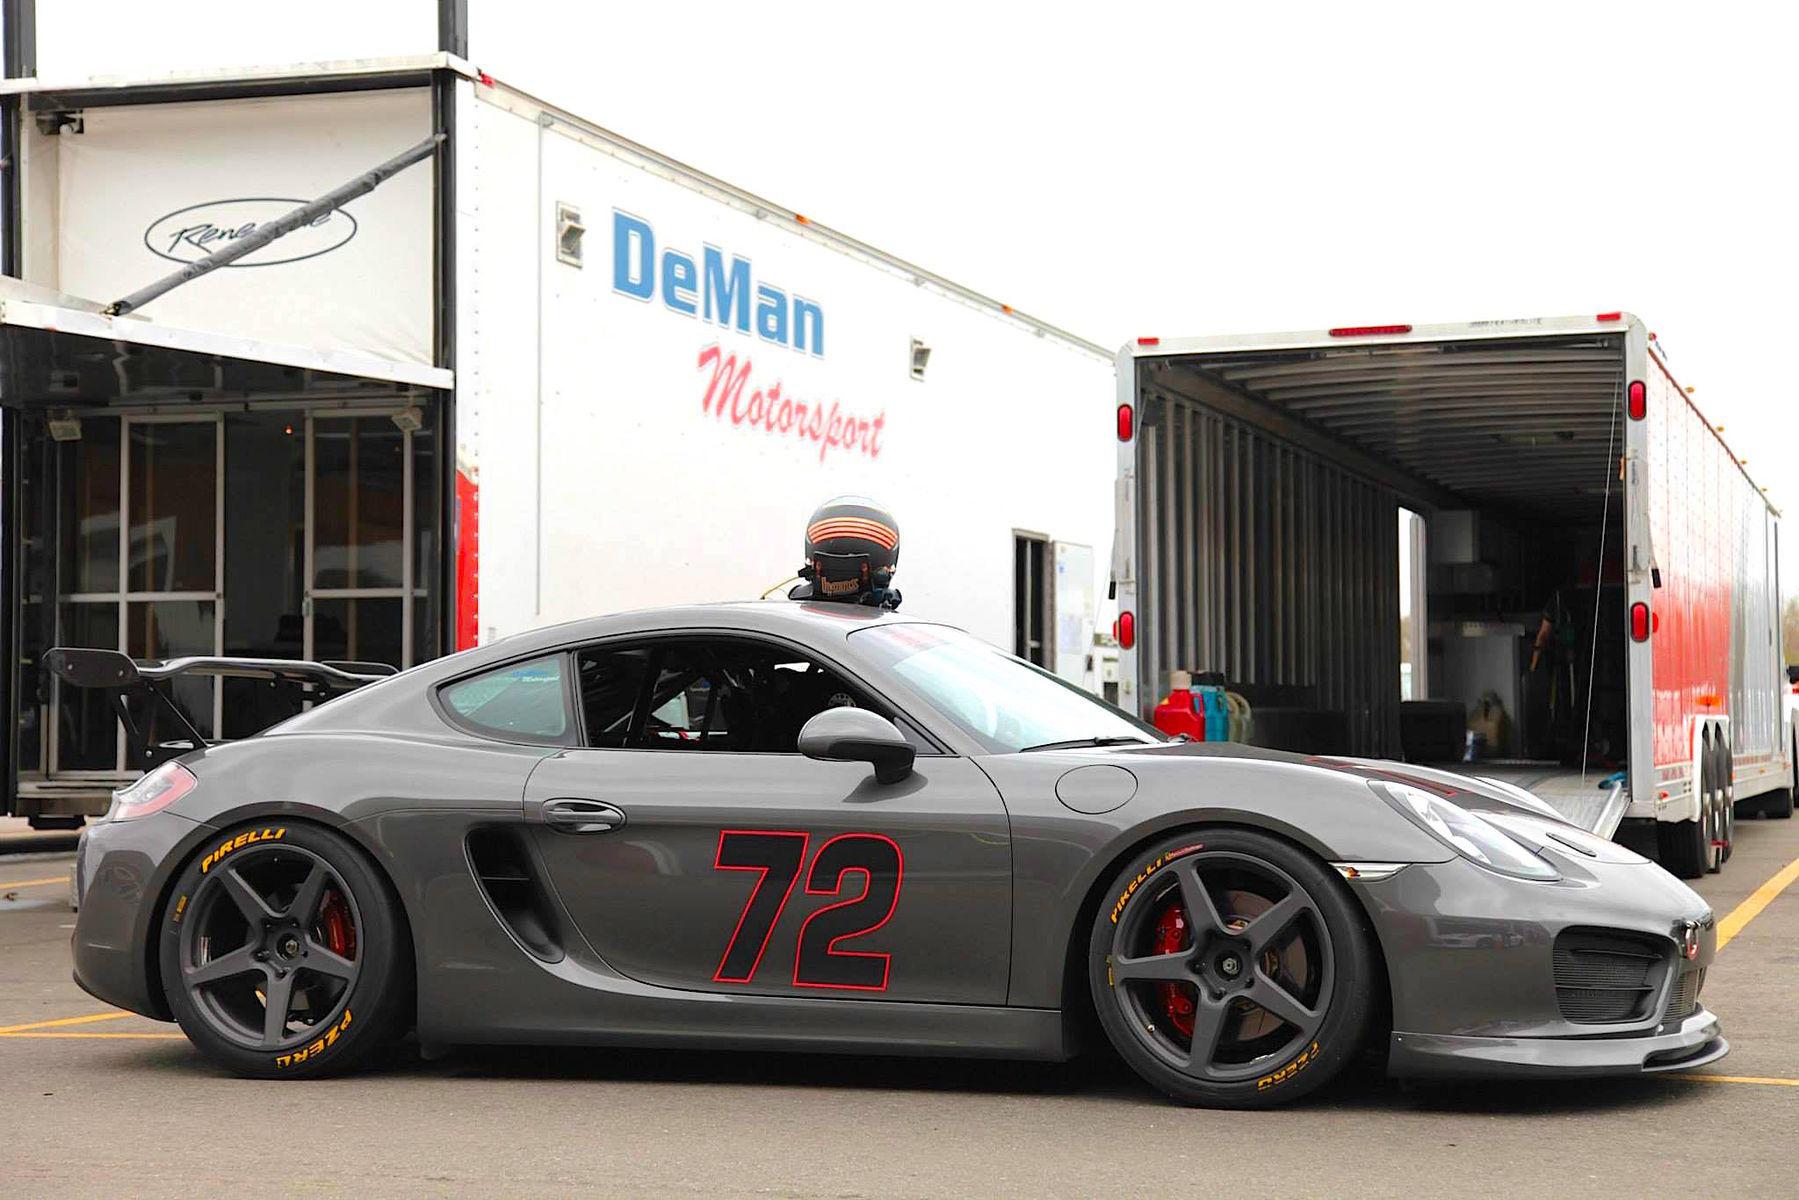 2015 Porsche Cayman S | Track-prepped Porsche Cayman S by DeMan Motorsport on Forgeline CF1R Open Lug Wheels